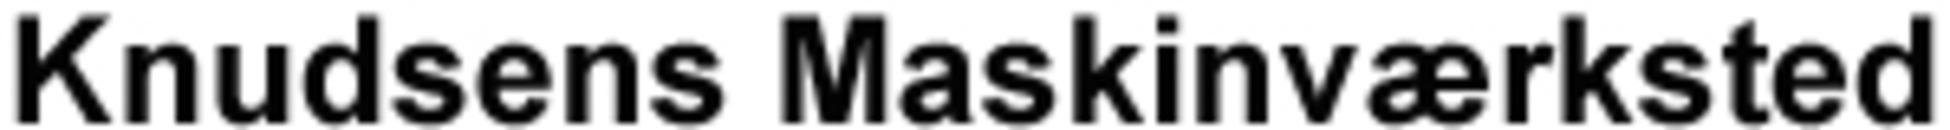 Knudsens Maskinværksted logo